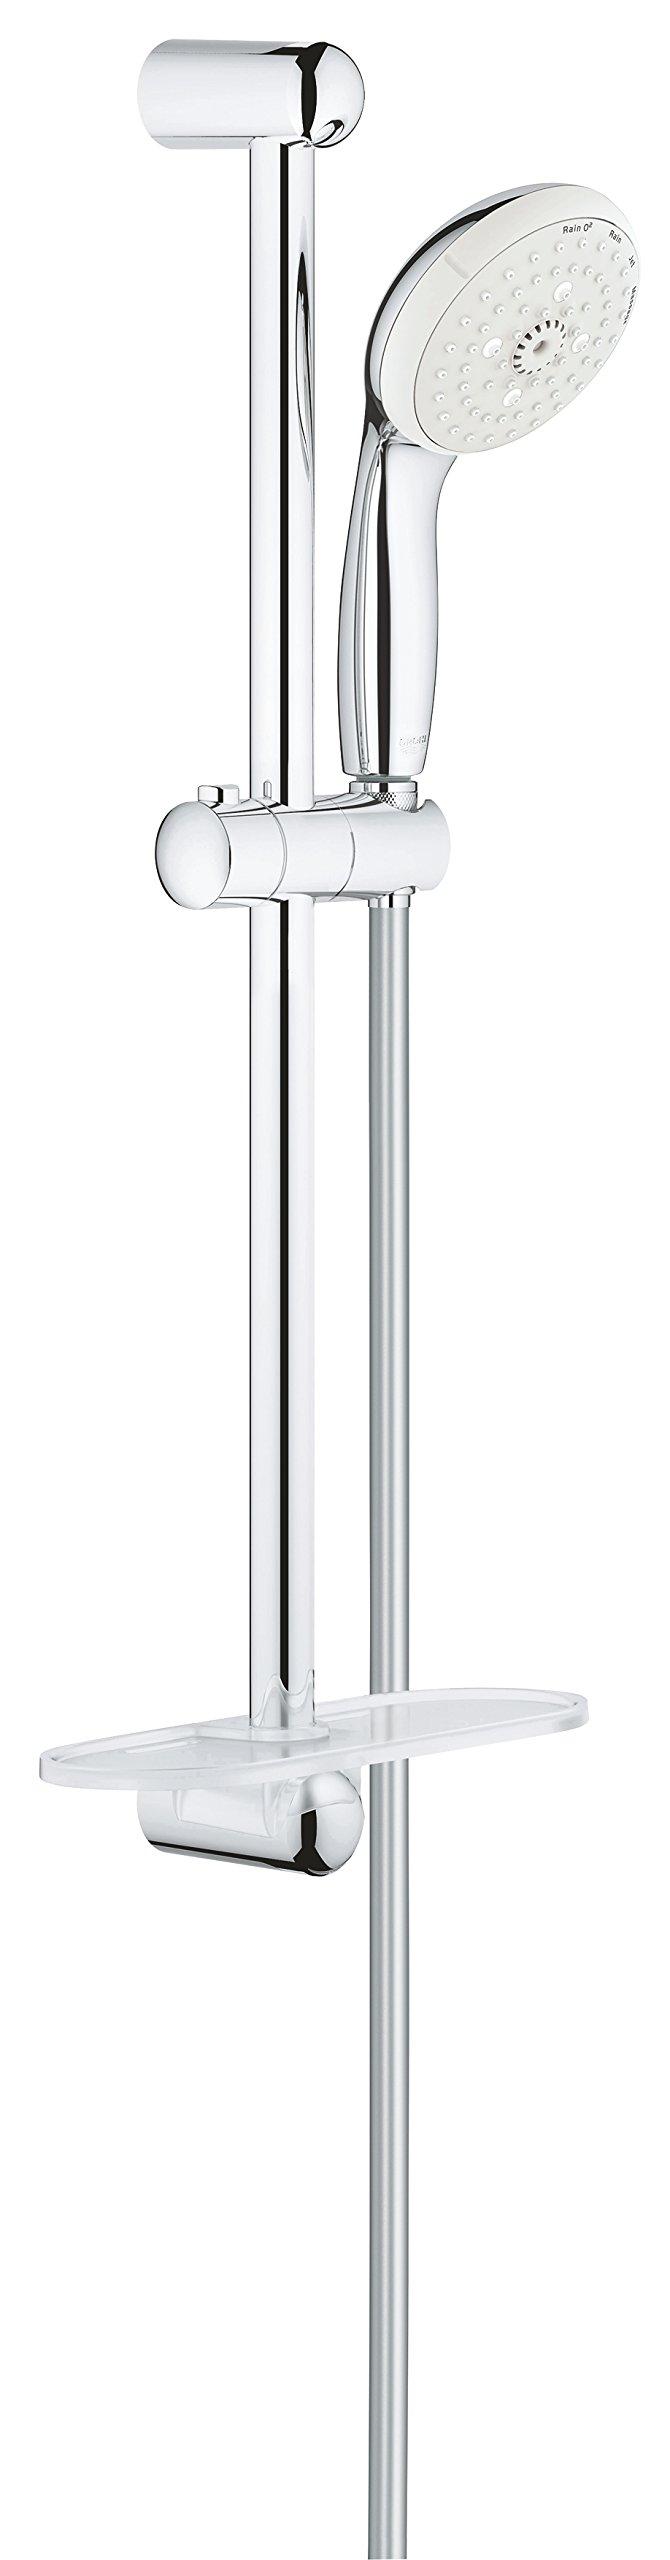 GROHE 28436002 Tempesta Classic 2.5 GPM 24'' 4-Spray Shower Rail Set, Starlight Chrome